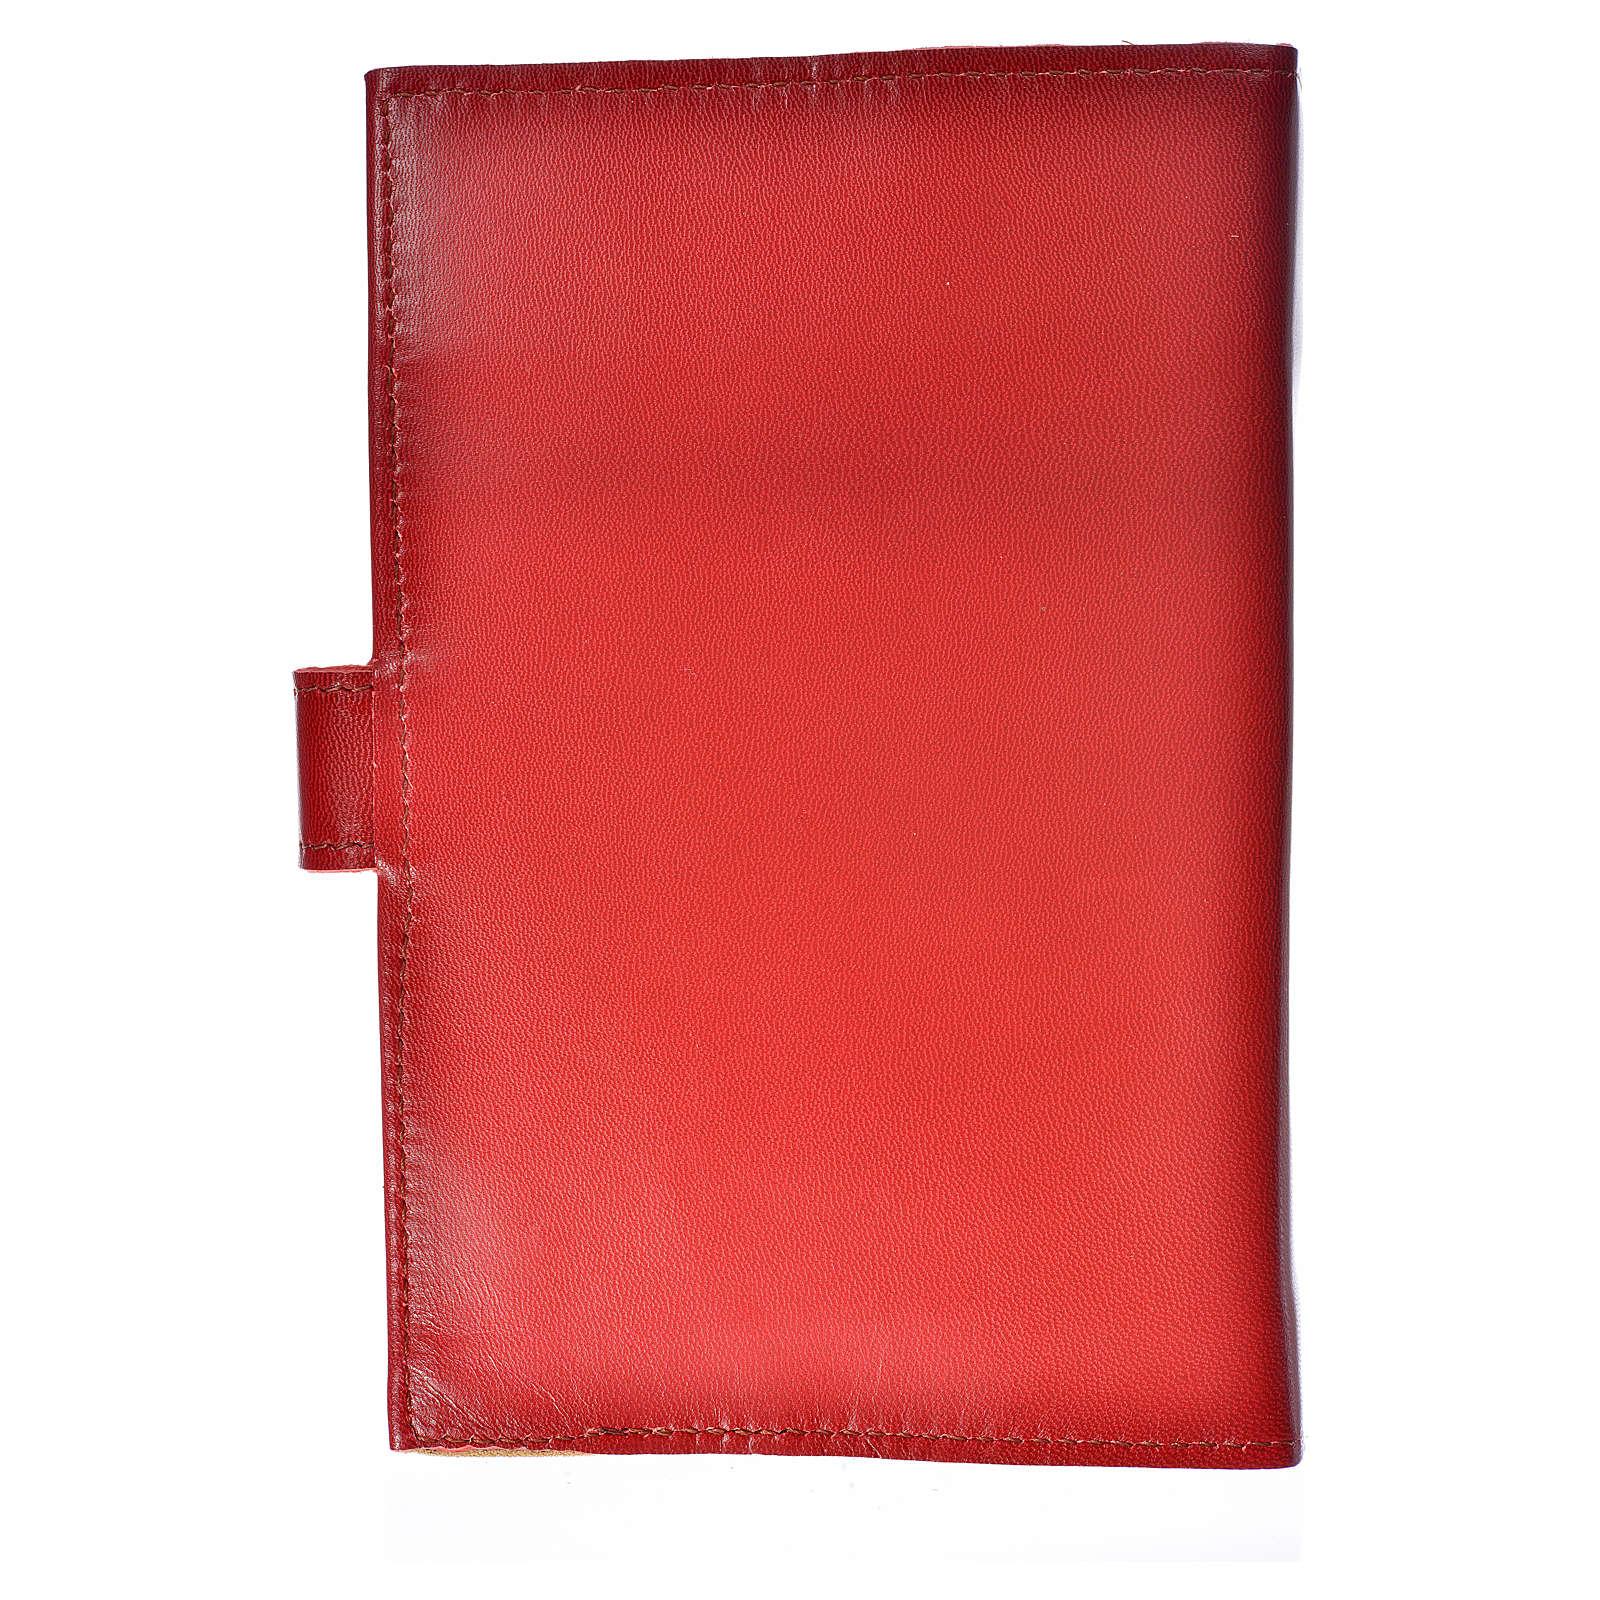 Catholic Bible cover burgundy leather Holy Family 4